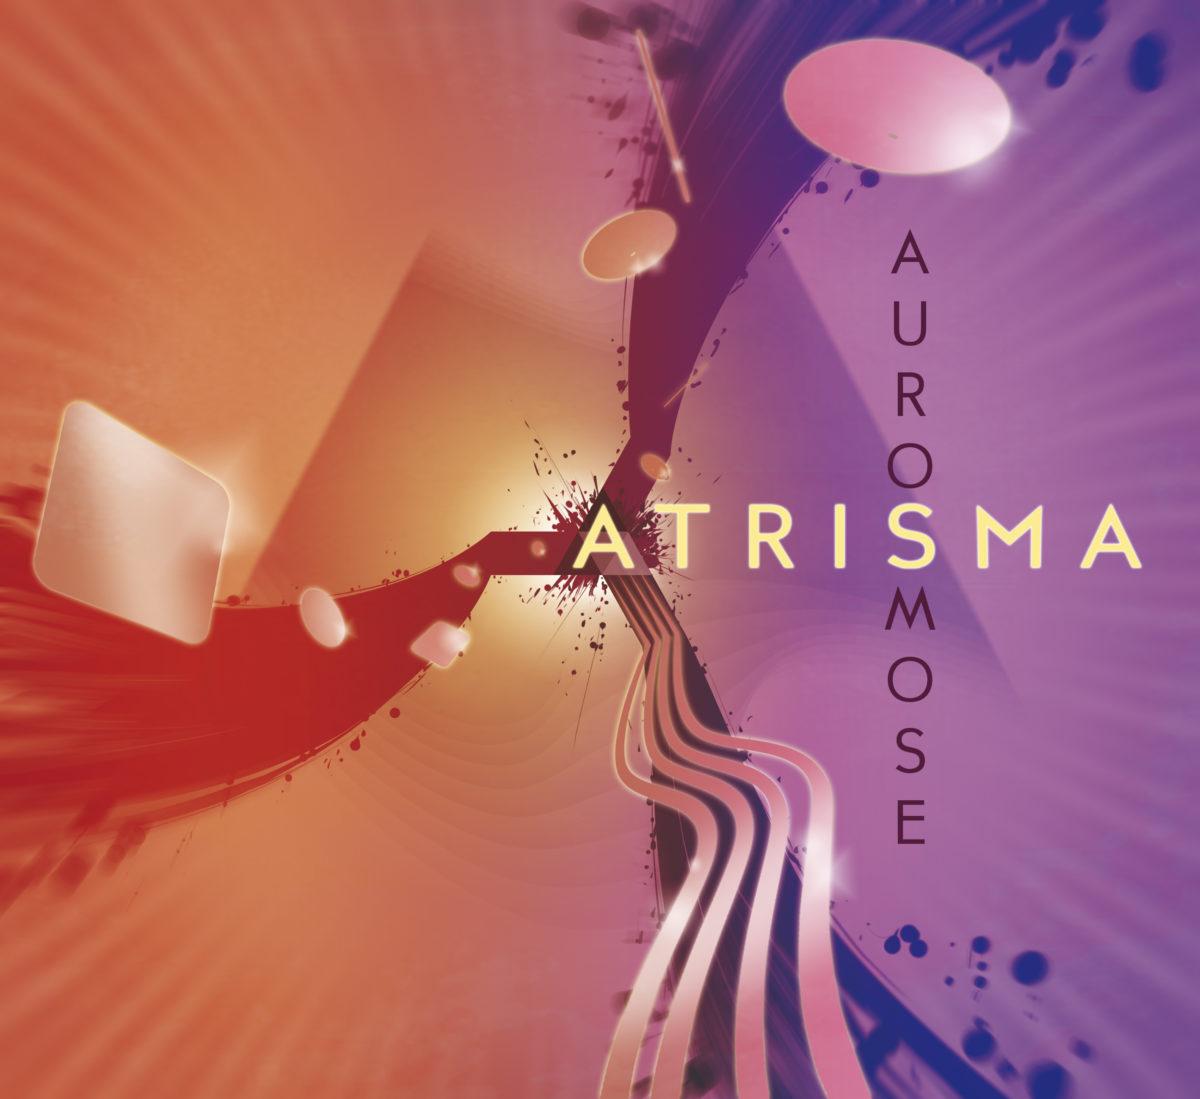 L'Aurosmose d'Atrisma